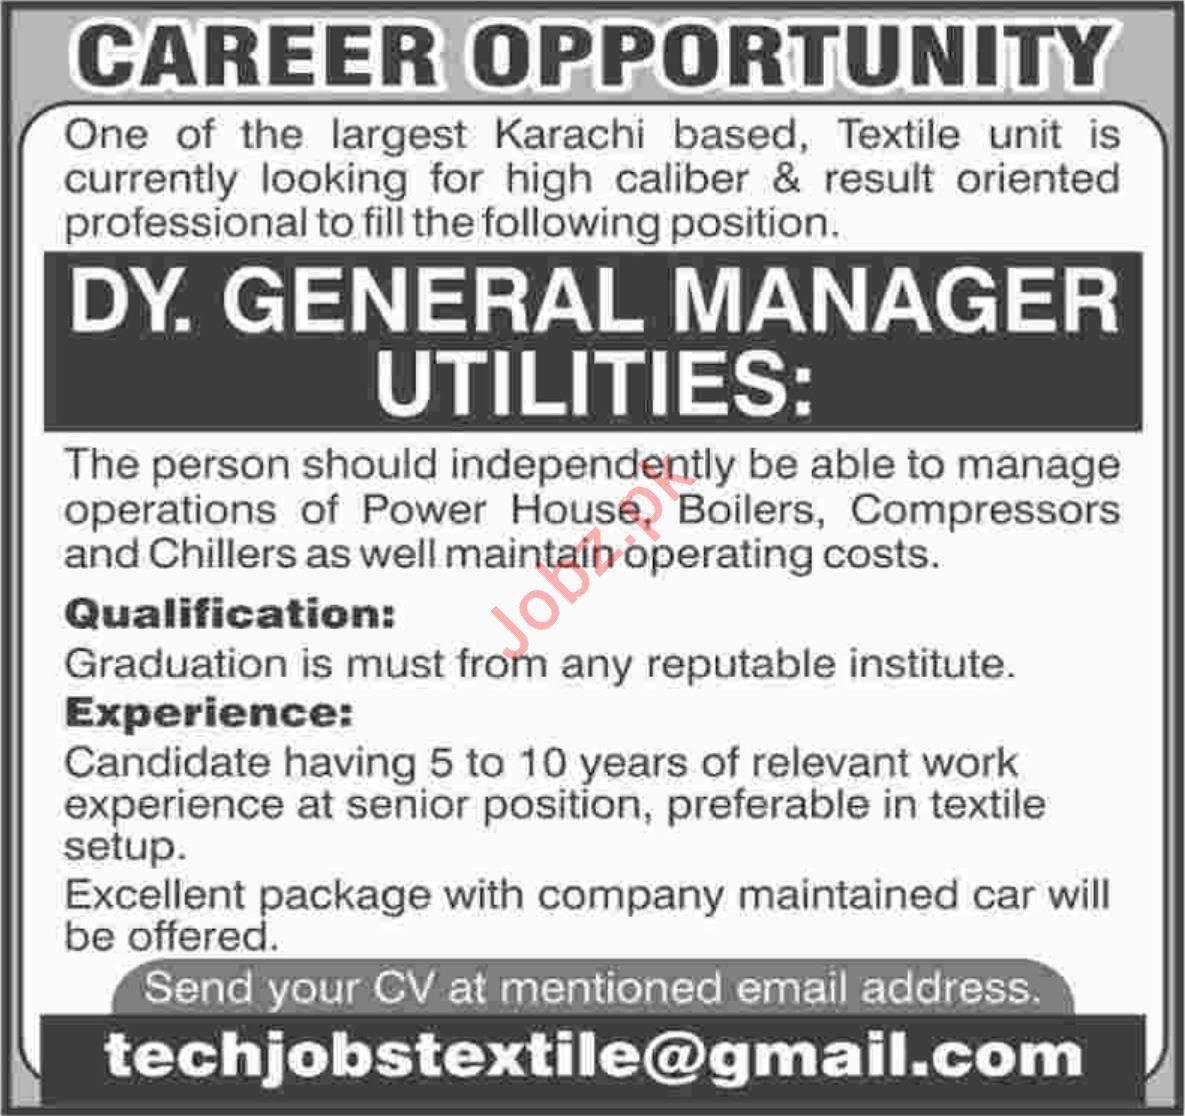 Deputy General Manager Utilities Job 2019 in Karachi